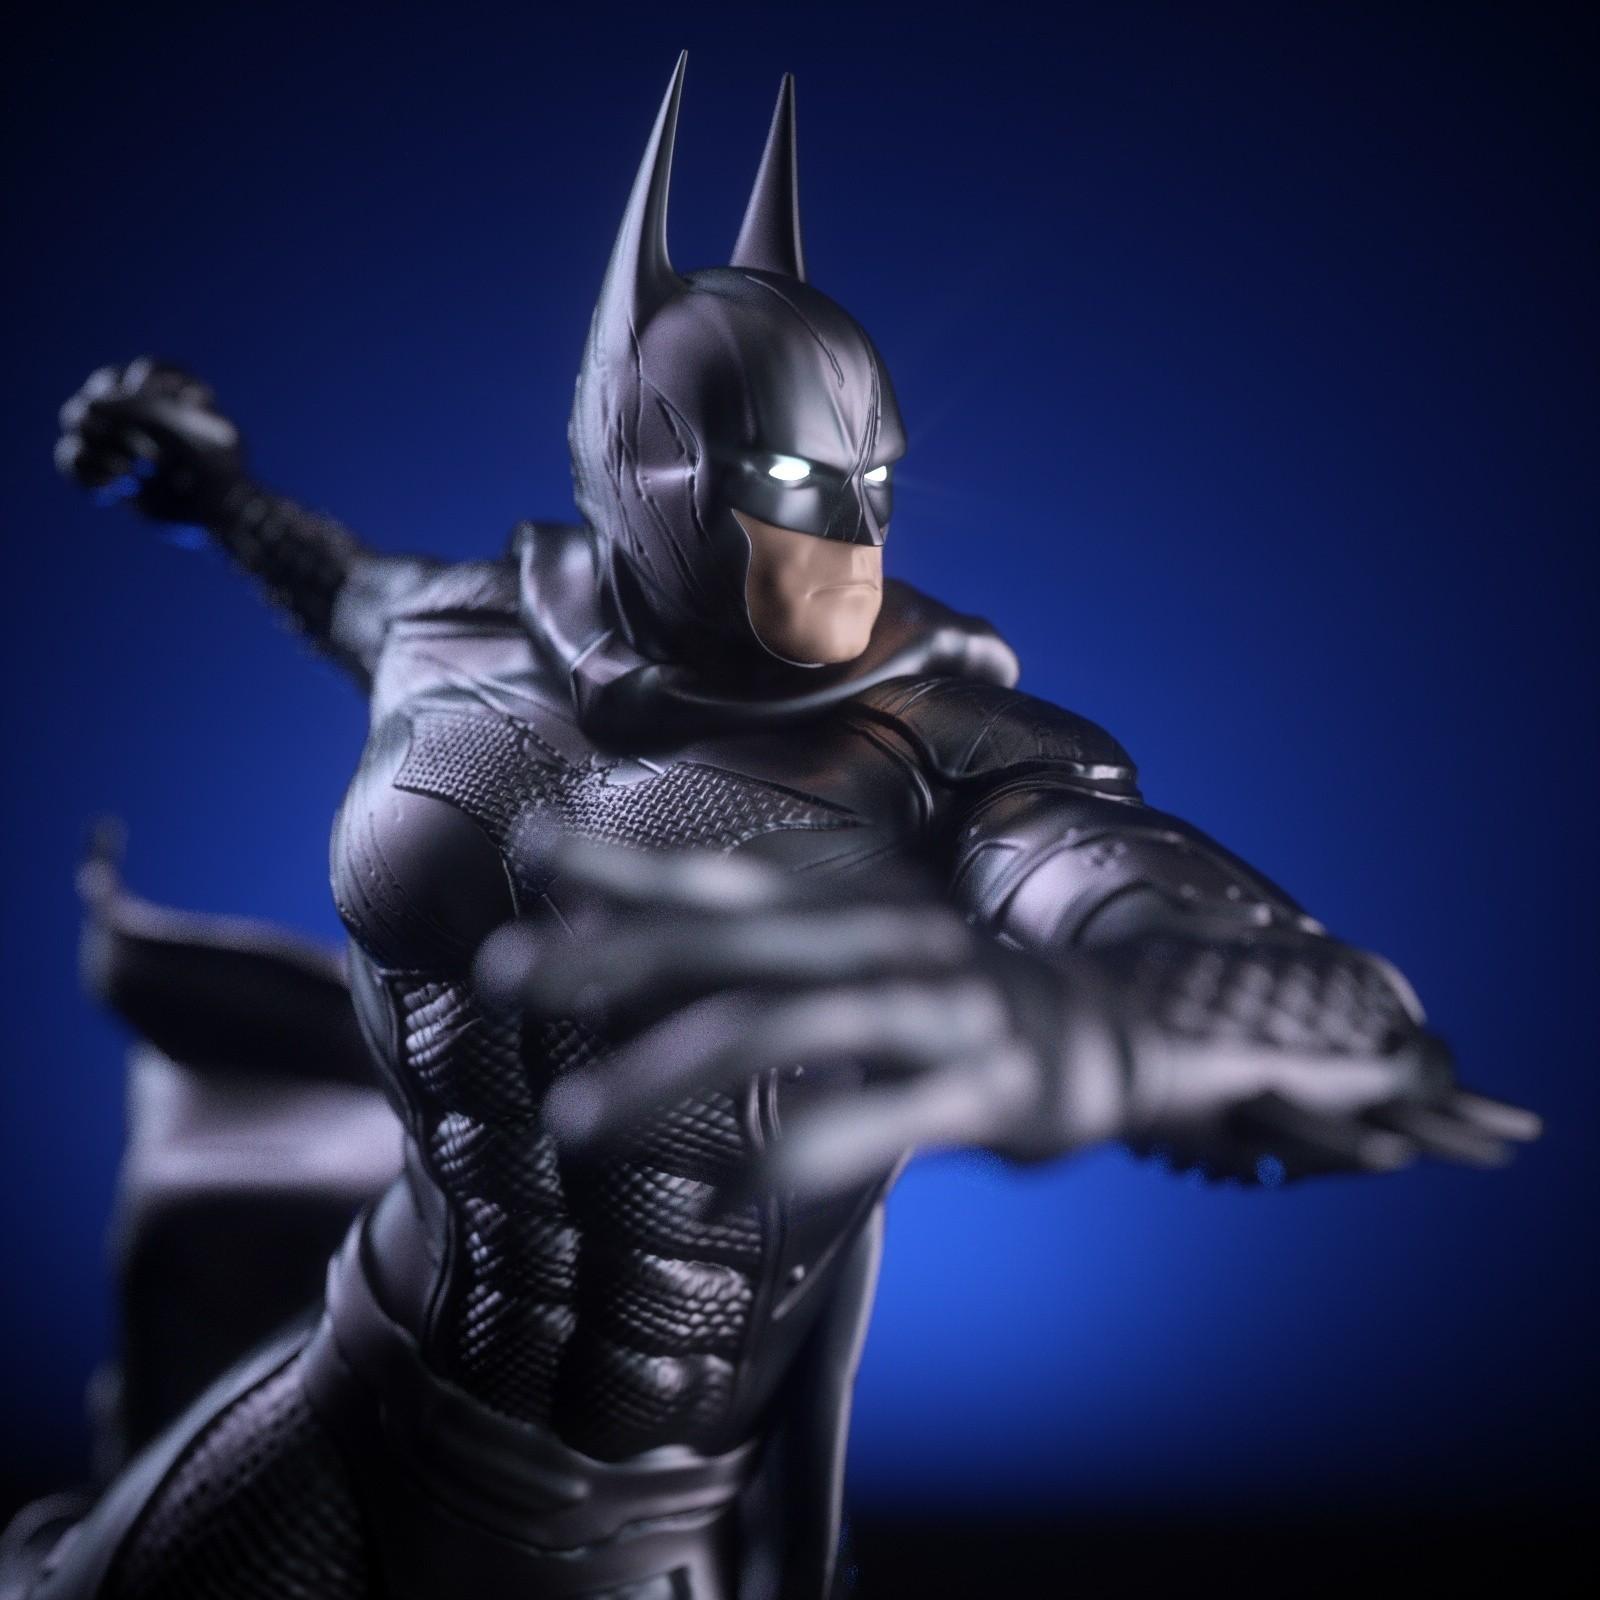 6.jpg Download OBJ file BATMAN Battle Pose • 3D print template, tolgaaxu